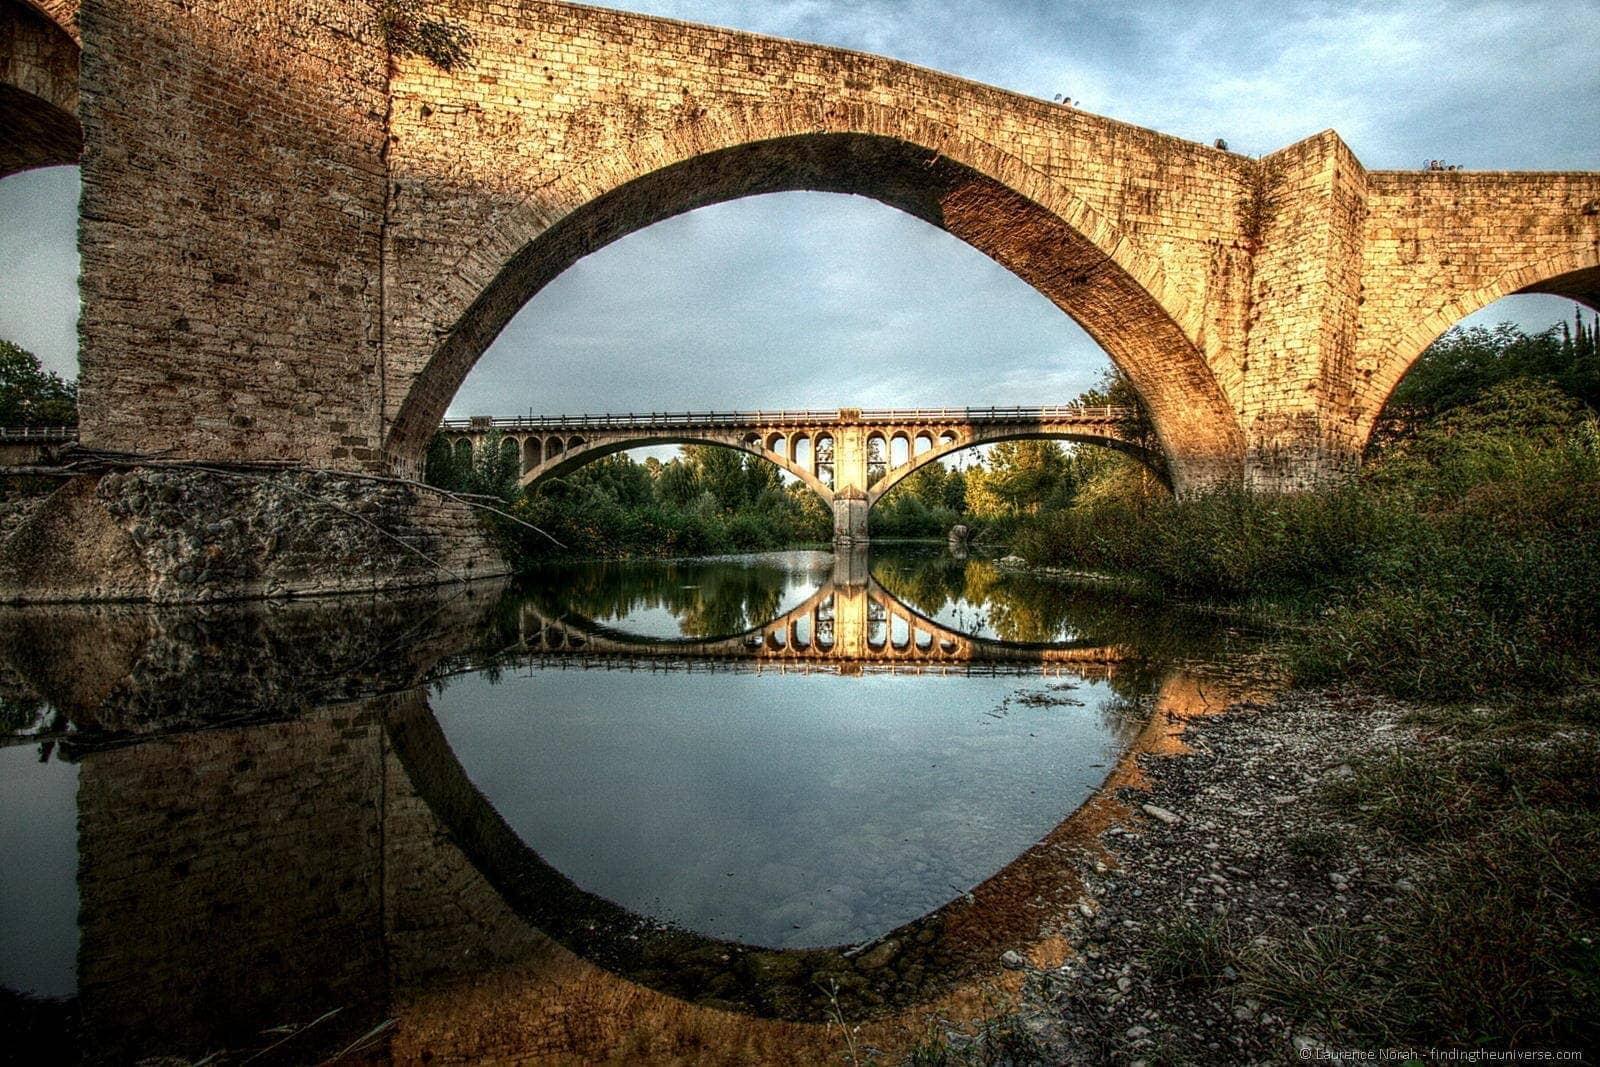 Besaulu Bridge